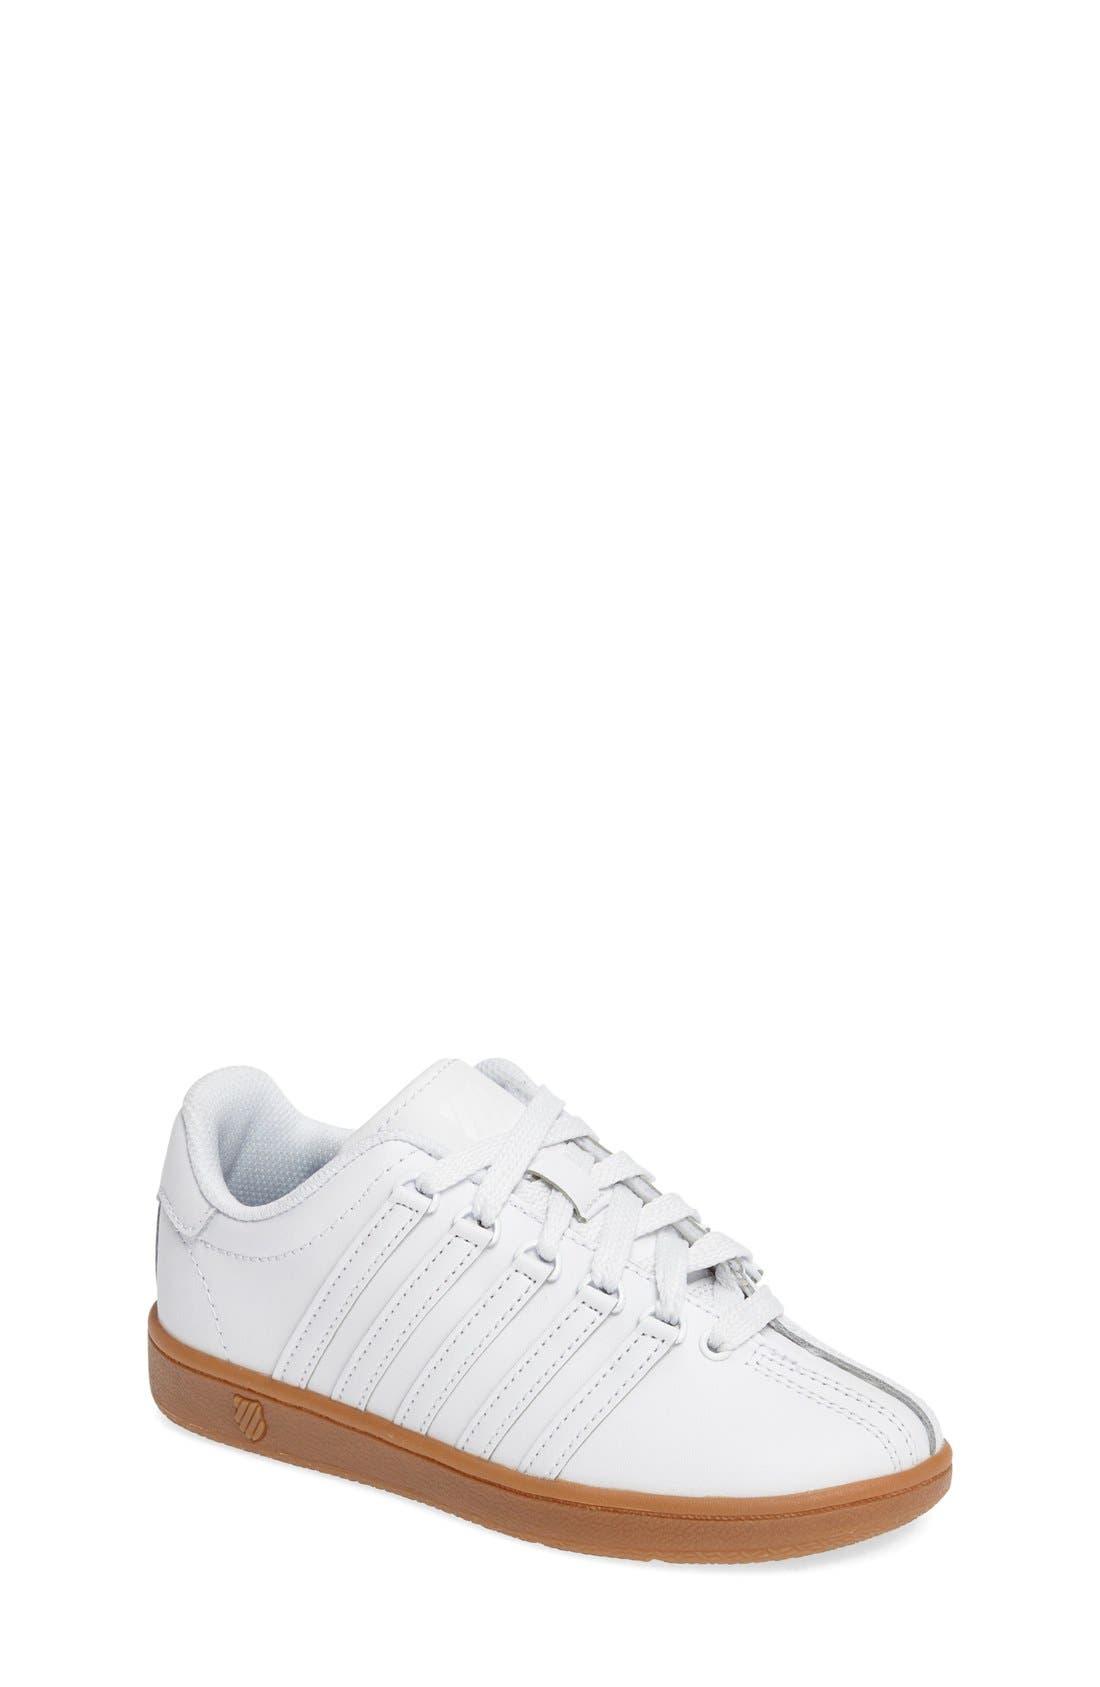 'Classic' Sneaker,                         Main,                         color, White/ Gum